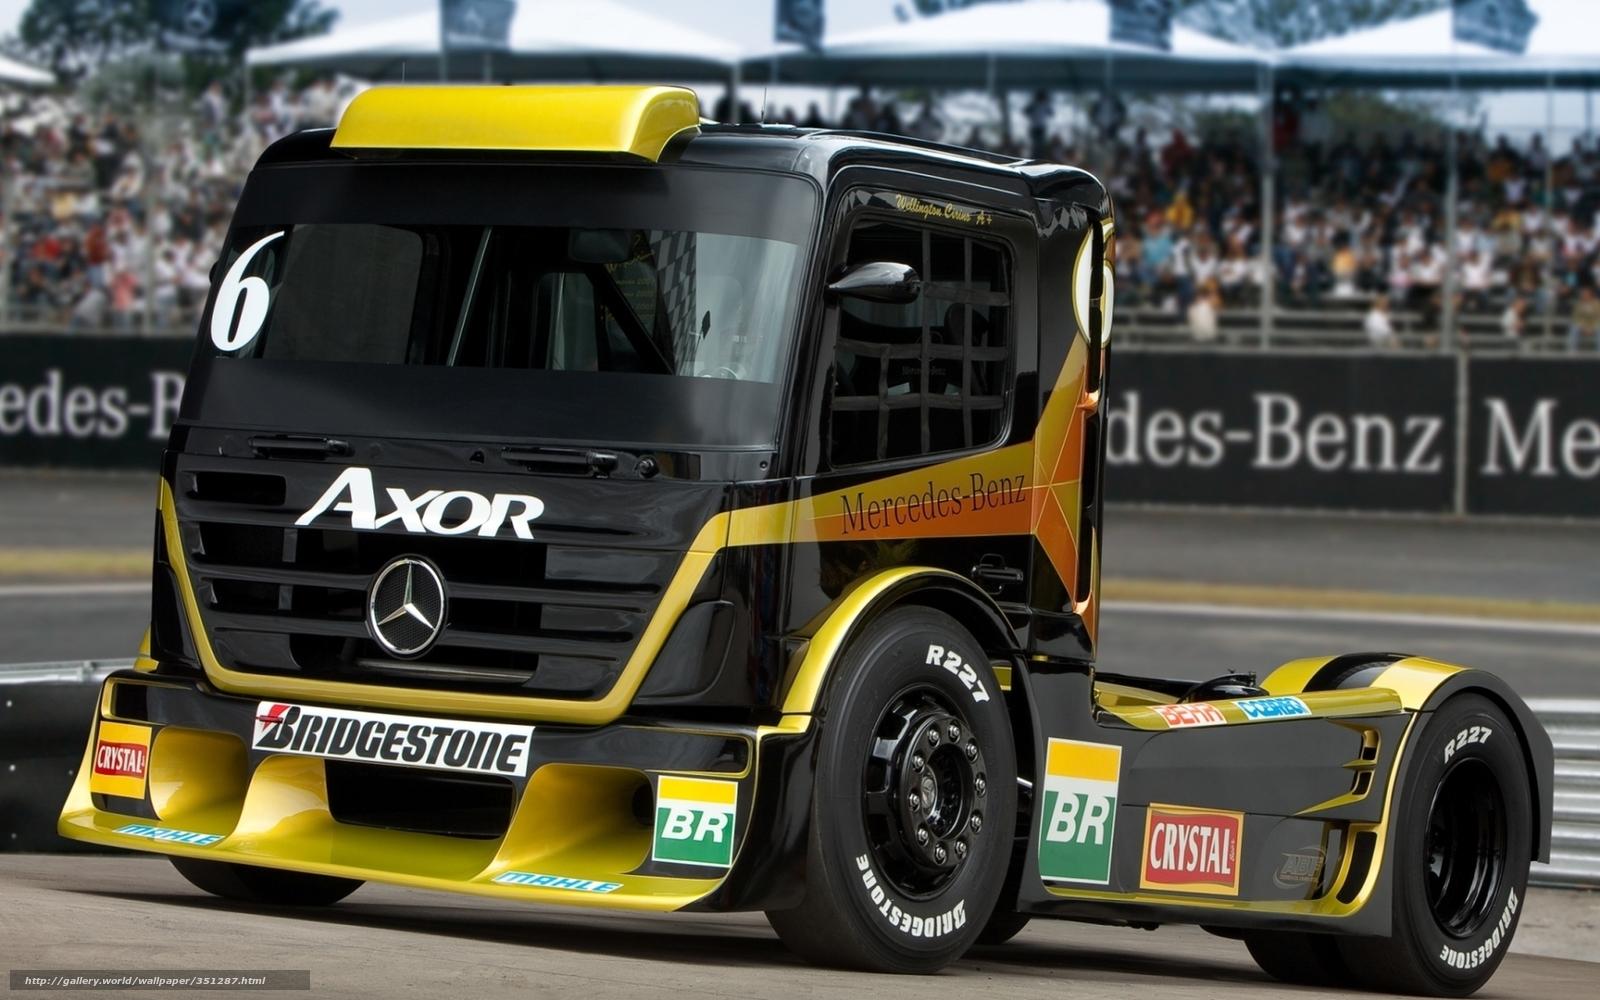 Download wallpaper Mercedes,  truck,  racing car,  front free desktop wallpaper in the resolution 1680x1050 — picture №351287